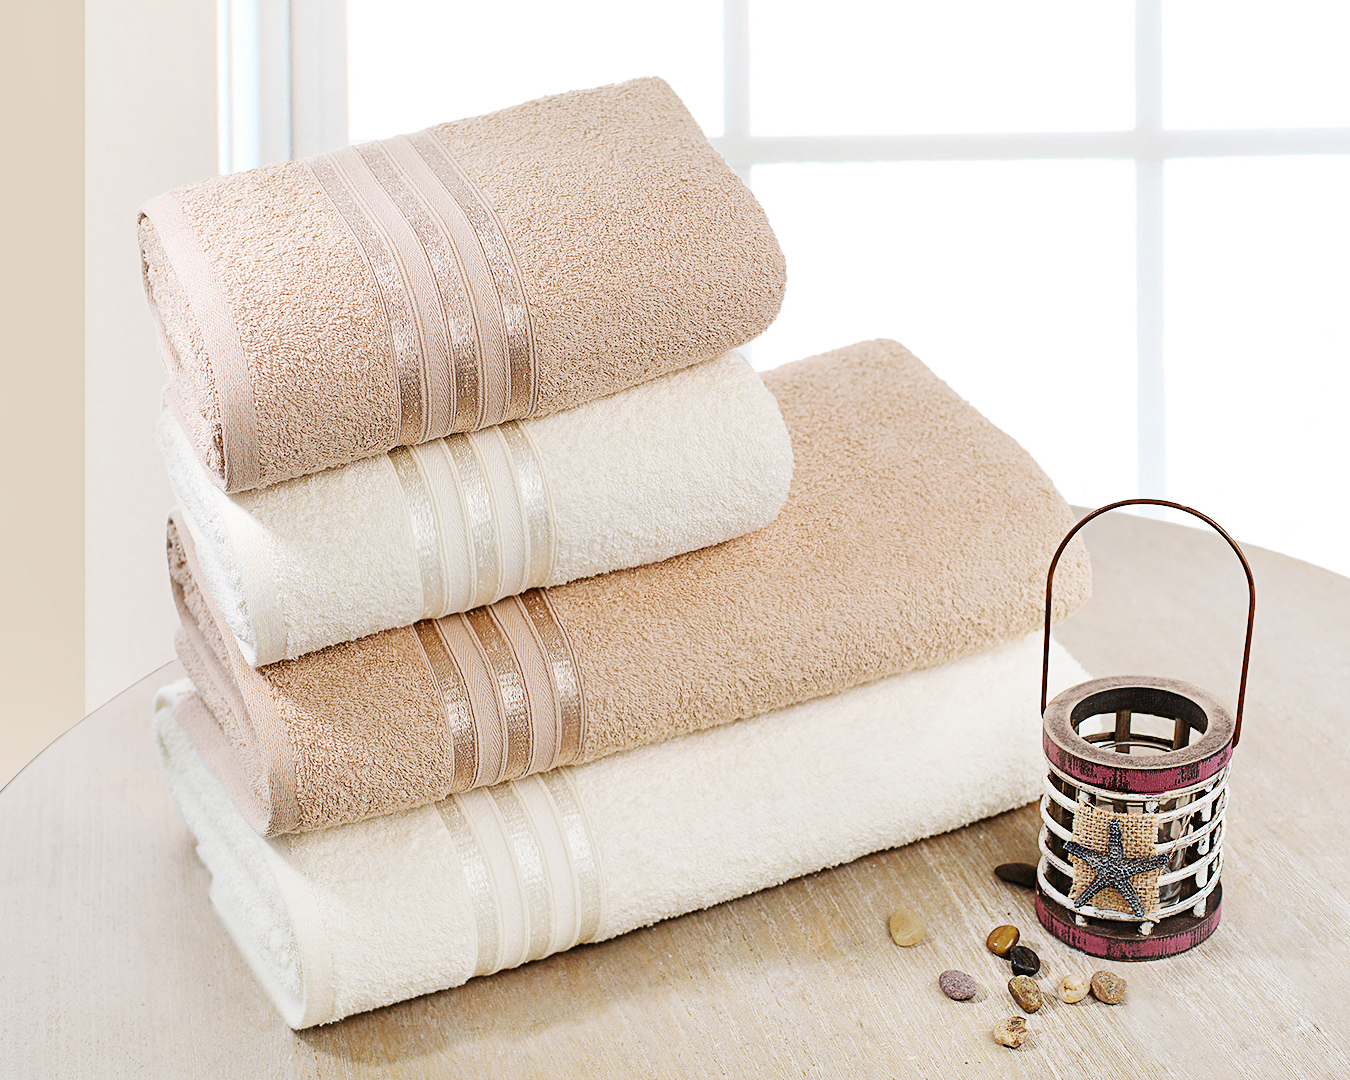 Полотенца Dome Набор из 4 полотенец Harmonika Цвет: Молочный/Бежевый полотенца кухонные la pastel набор полотенец 4 предмета из микрофибры 30х30